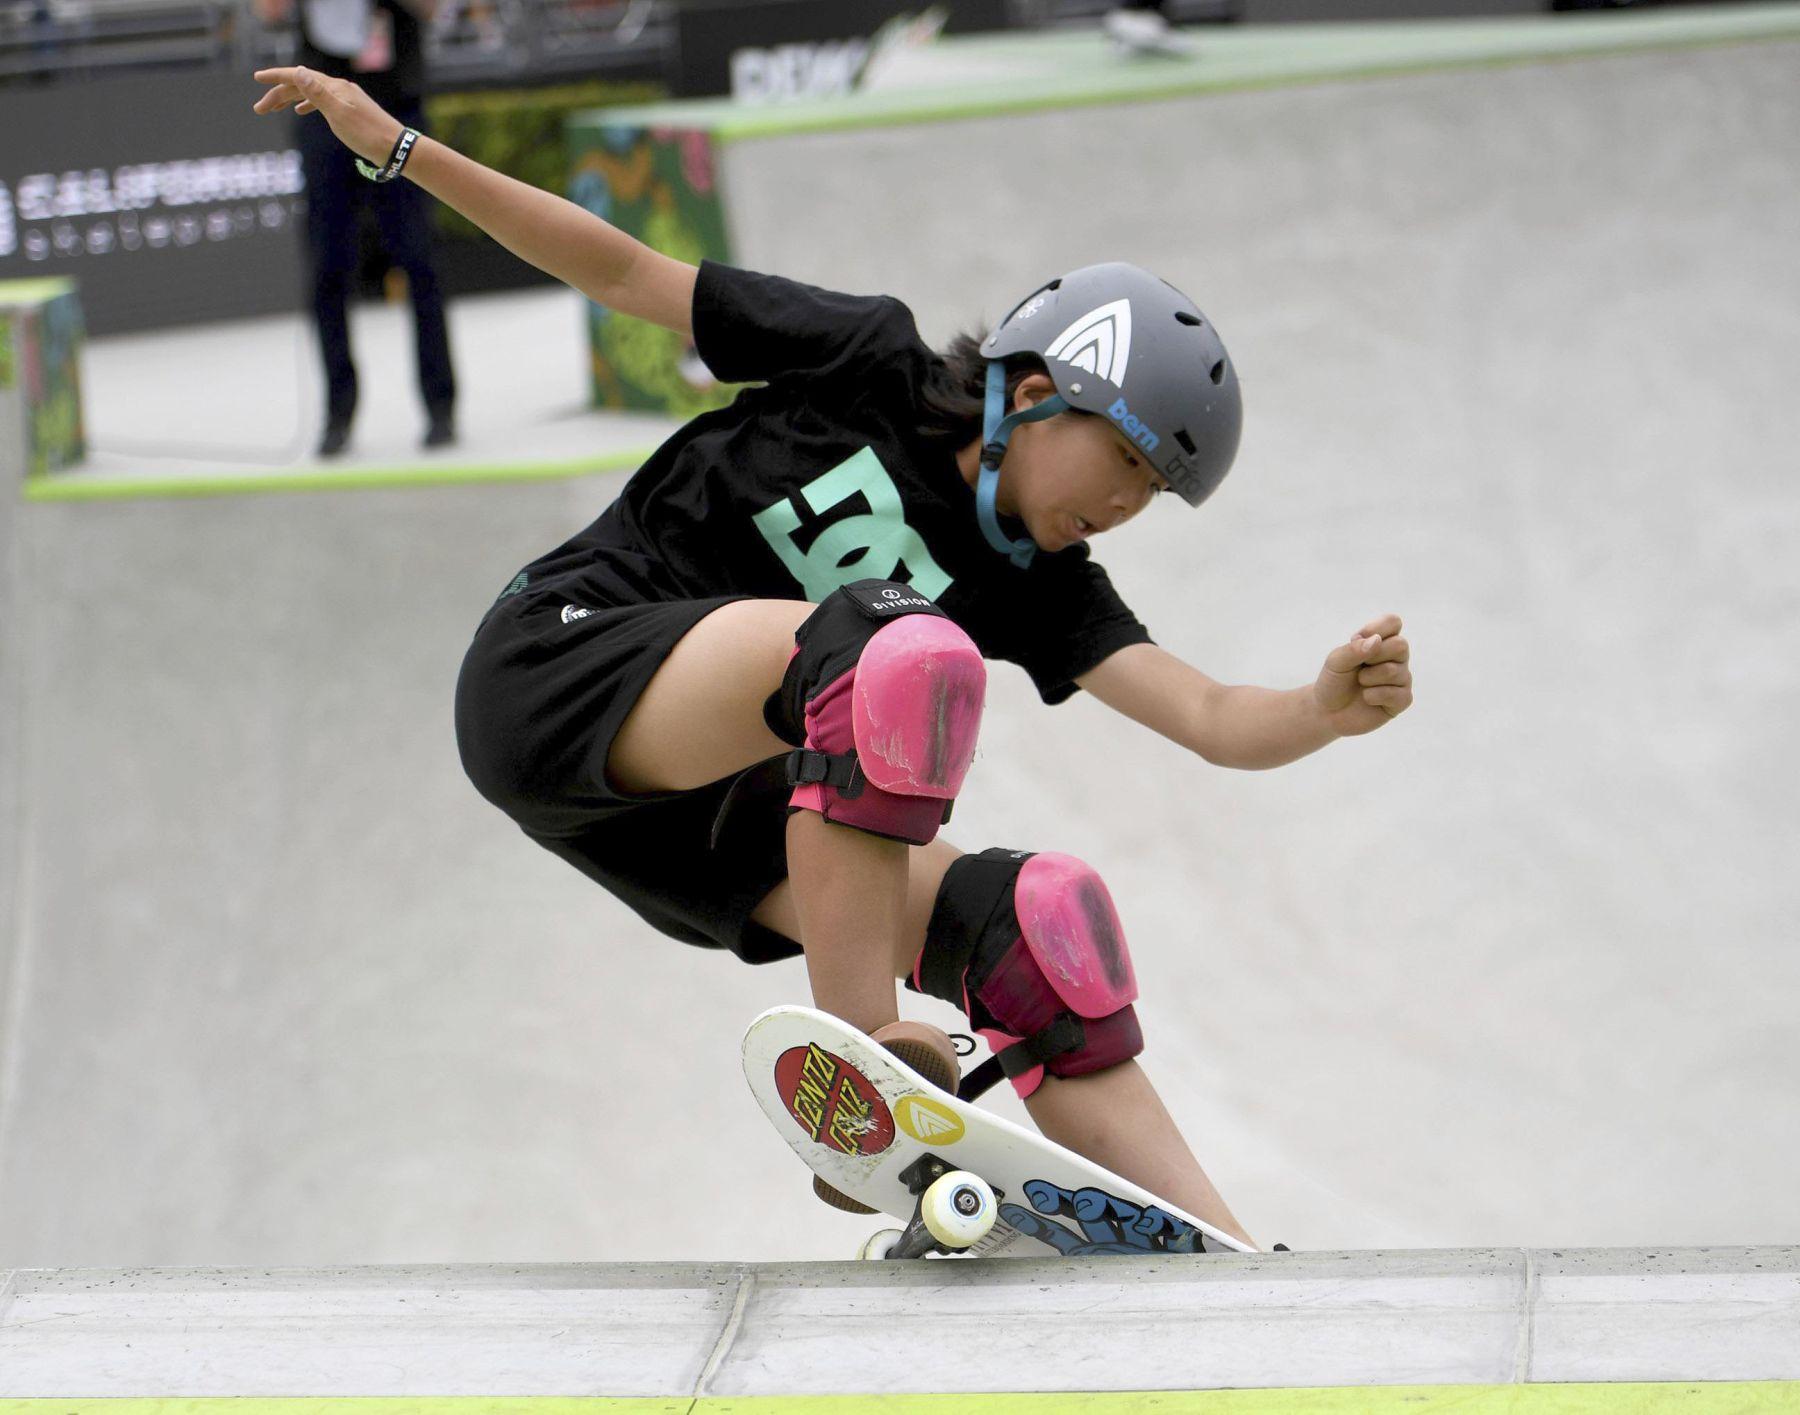 Misugu Okamoto Japan Wins in the Womens Park Skateboard Final 006